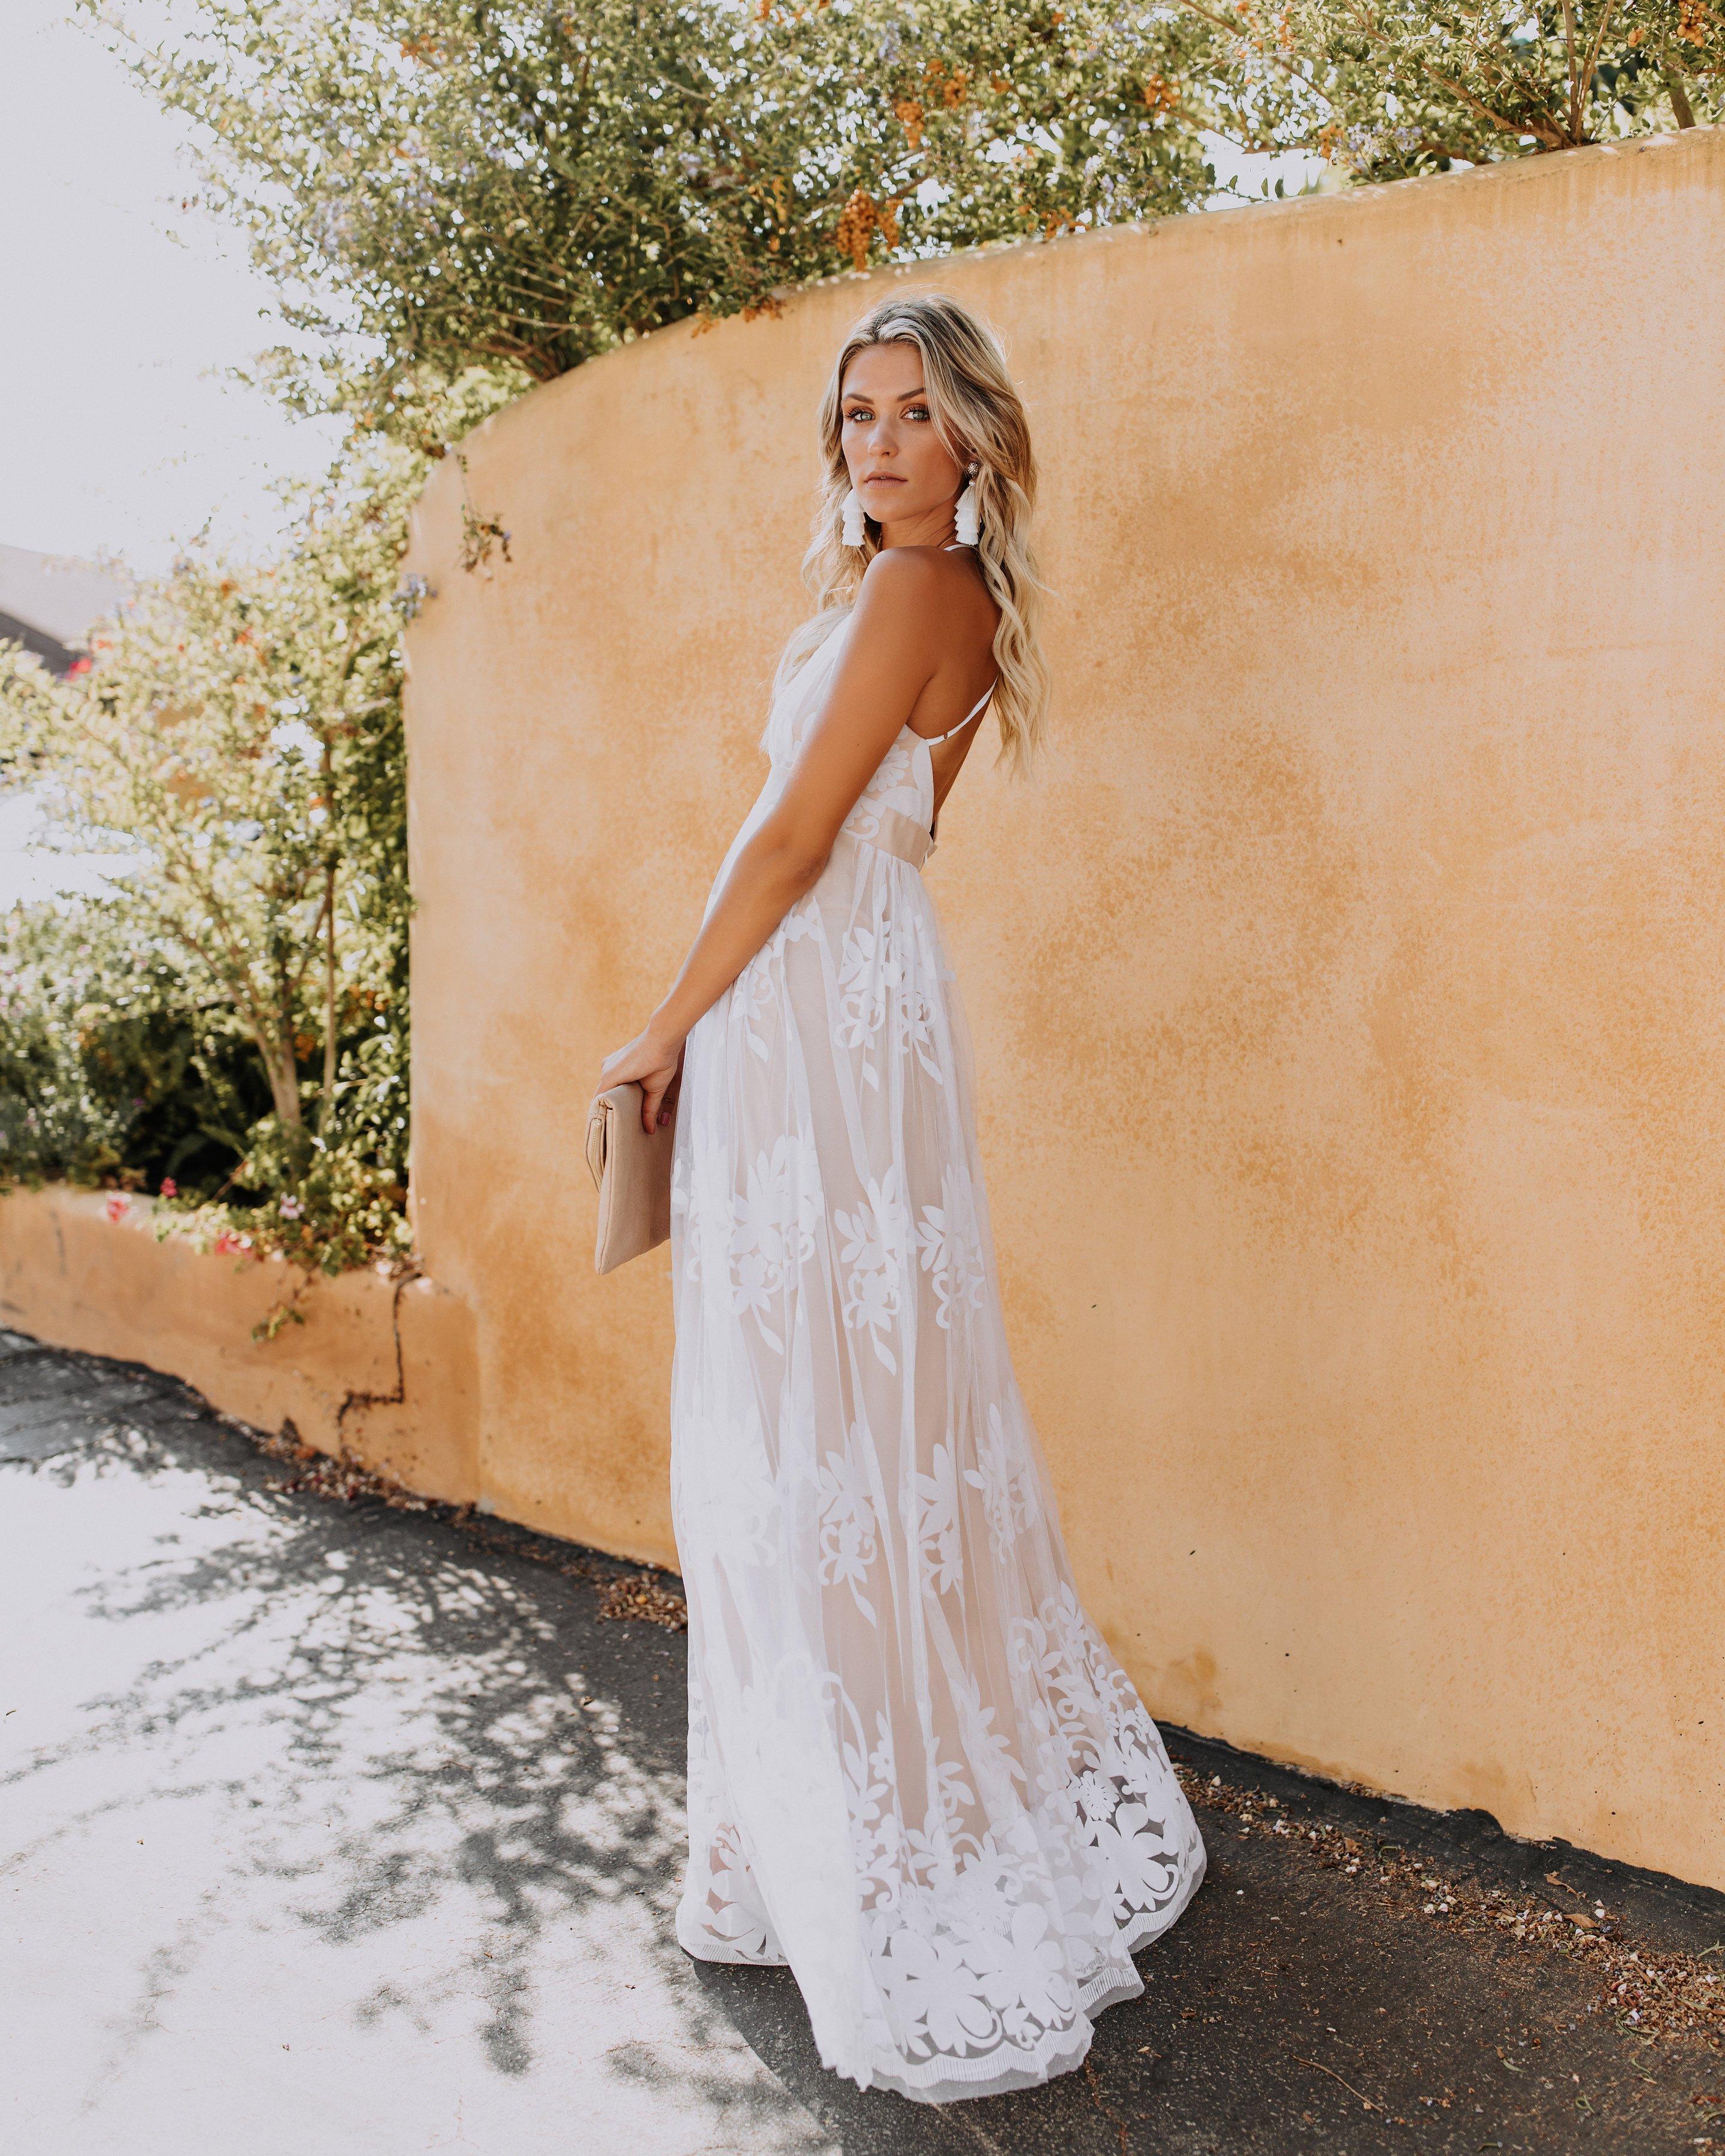 56a99ba7c84 PREORDER - Antonia Maxi Dress - White in 2019